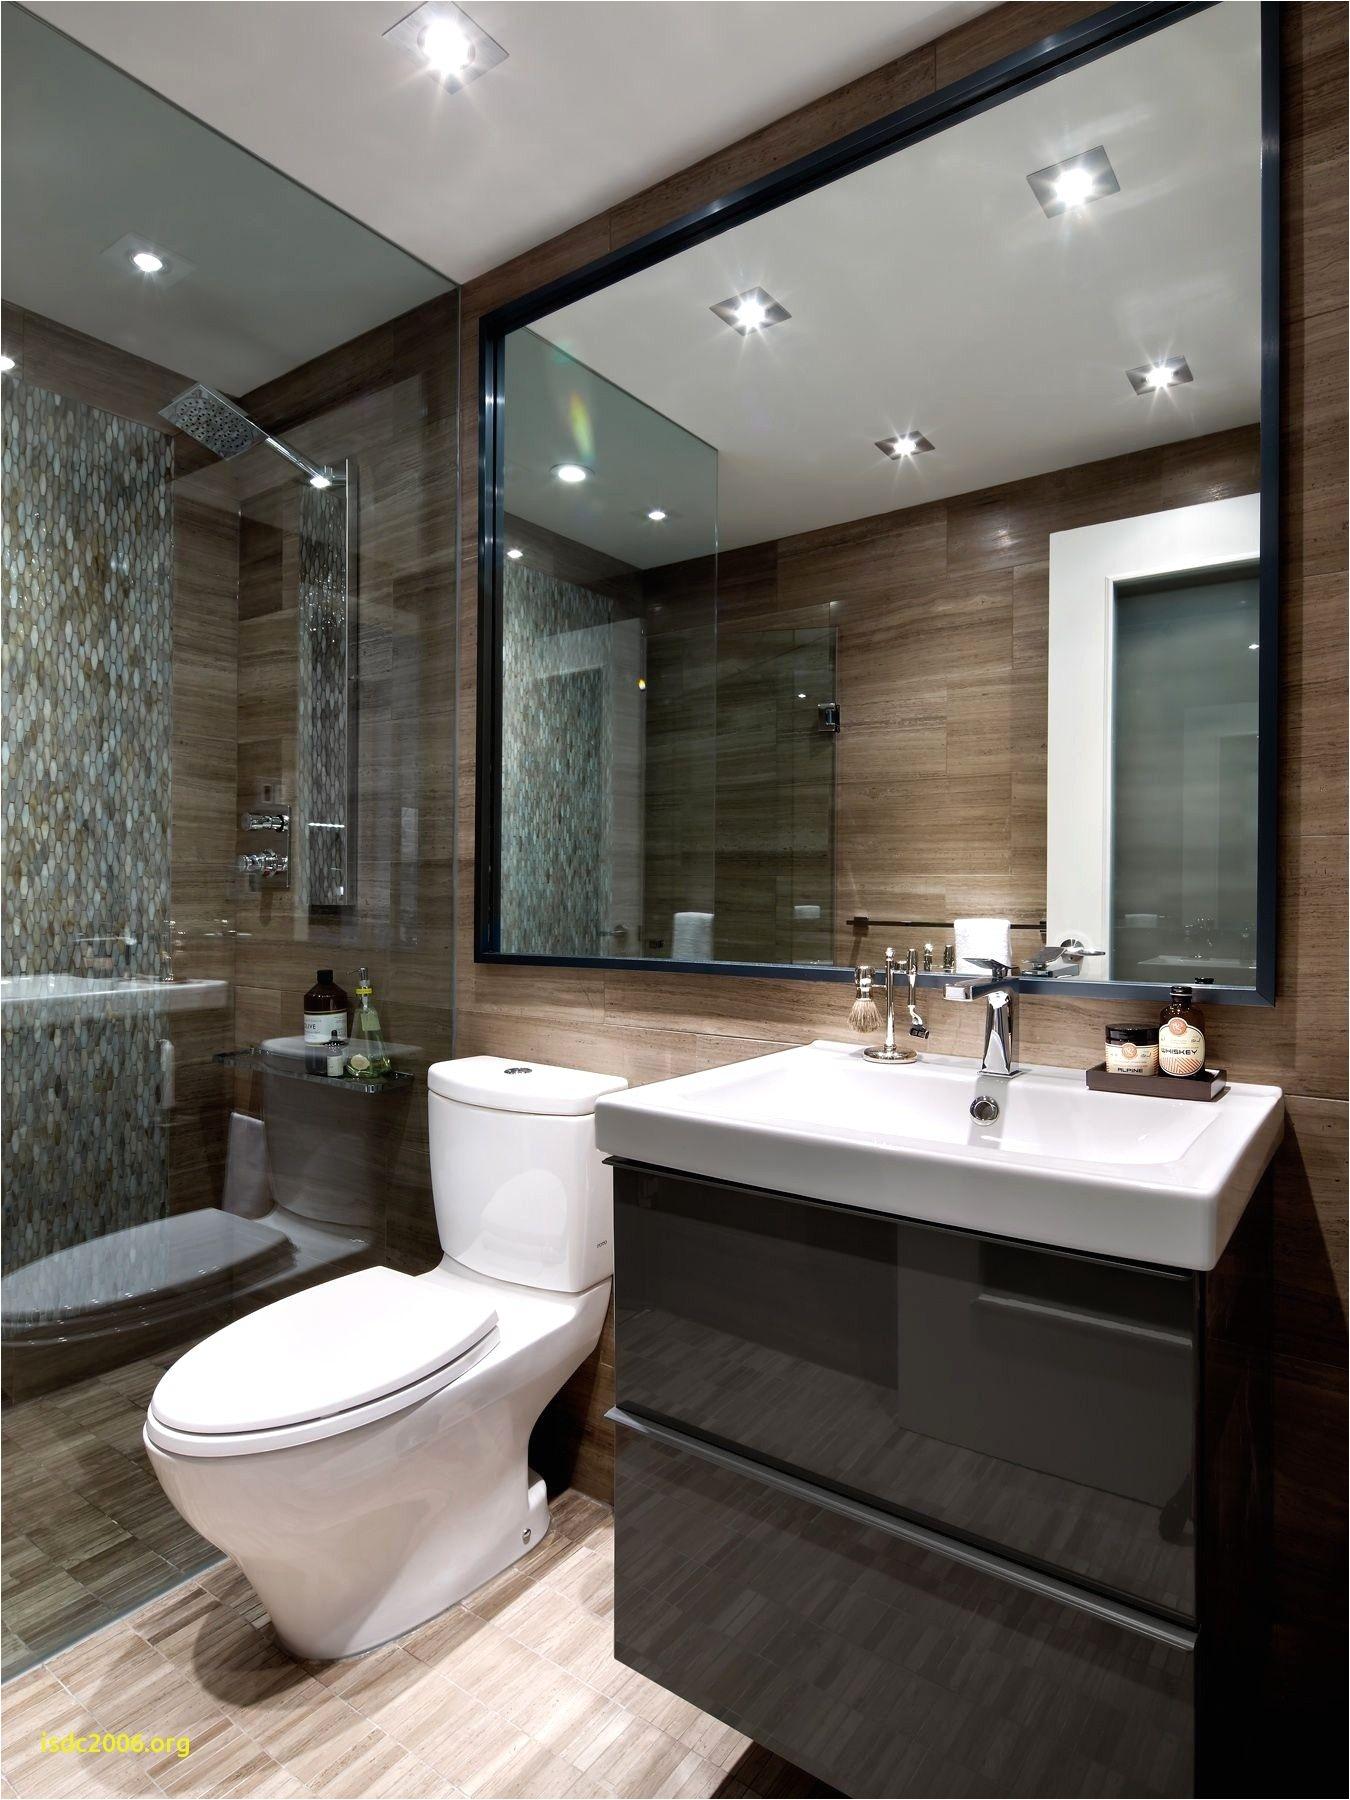 Bathroom 35 Bathroom Ideas Likable Unique Small Bathroom Lighting Fresh Tag Toilet Ideas 0d